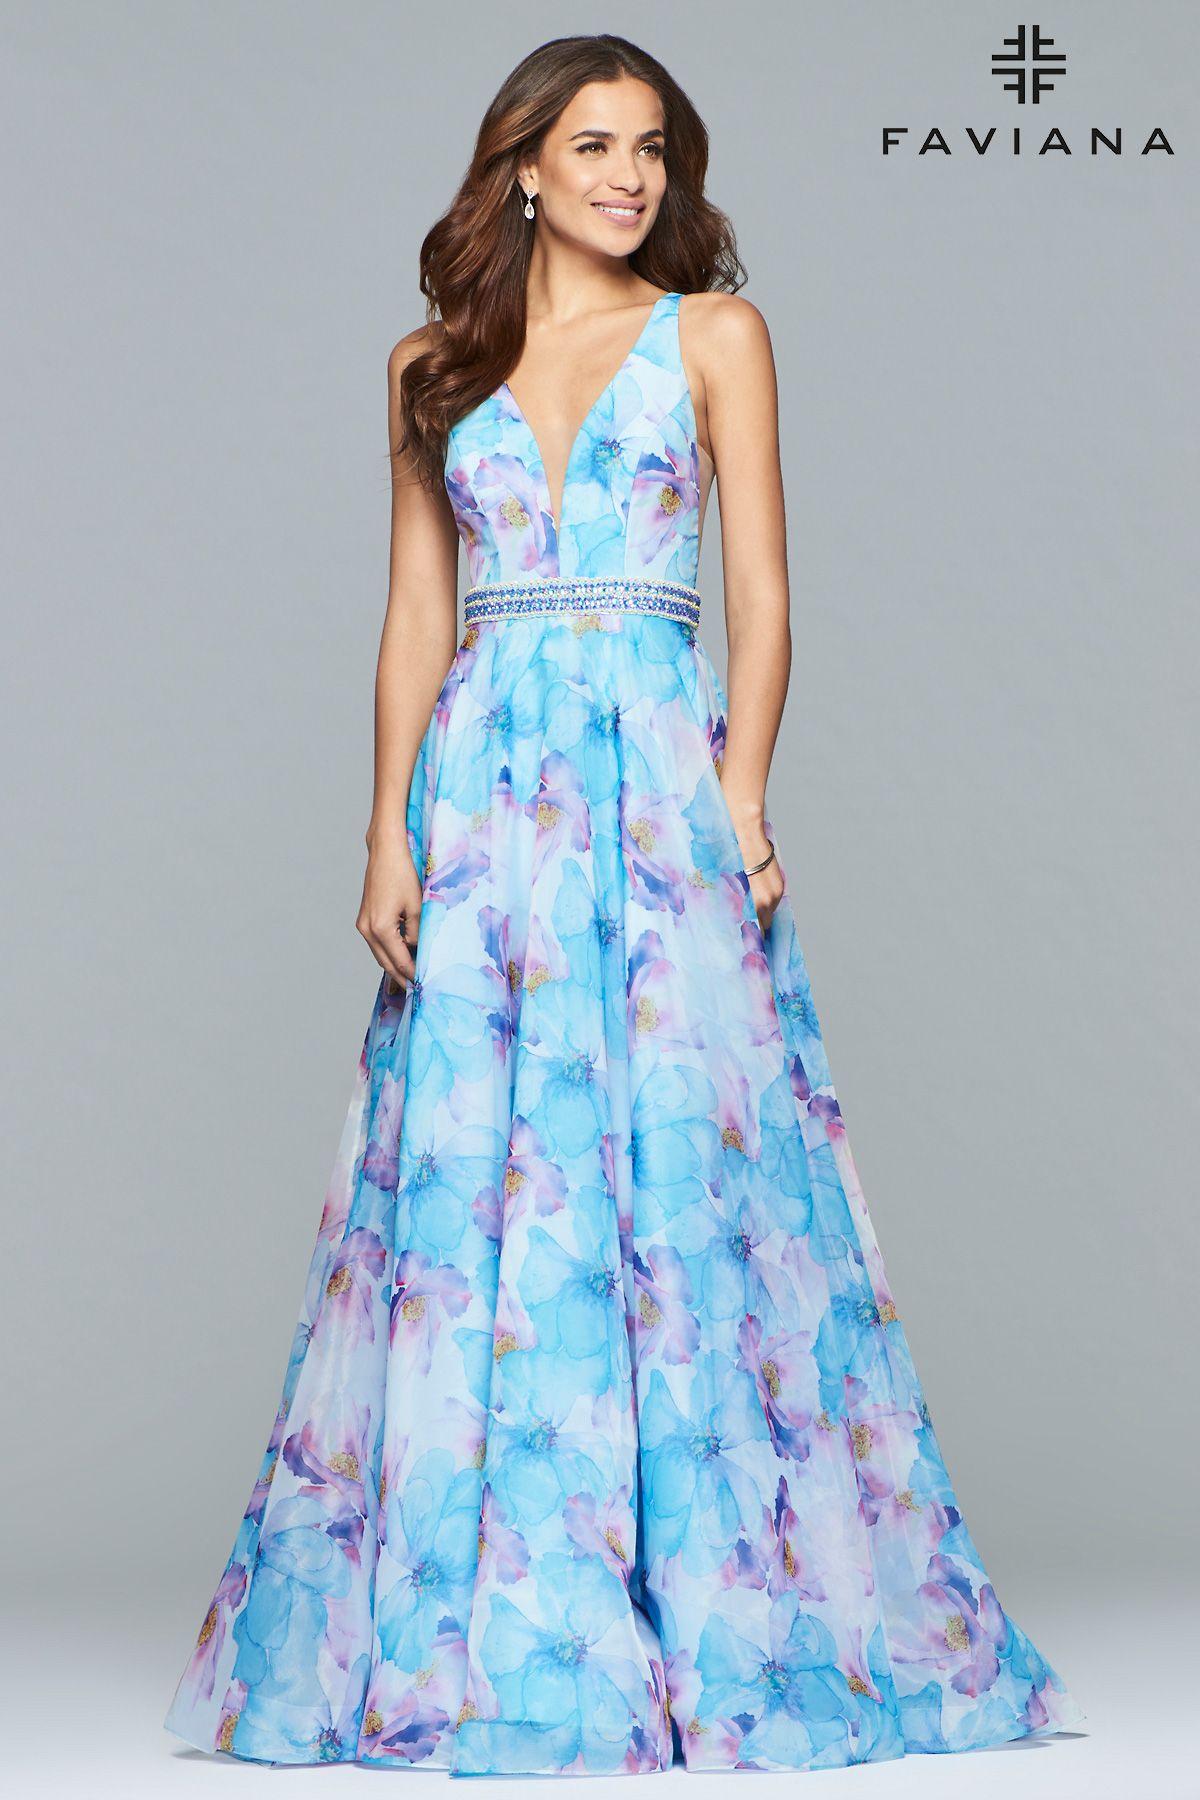 Faviana S10063 - International Prom Association Dresses #promdress ...